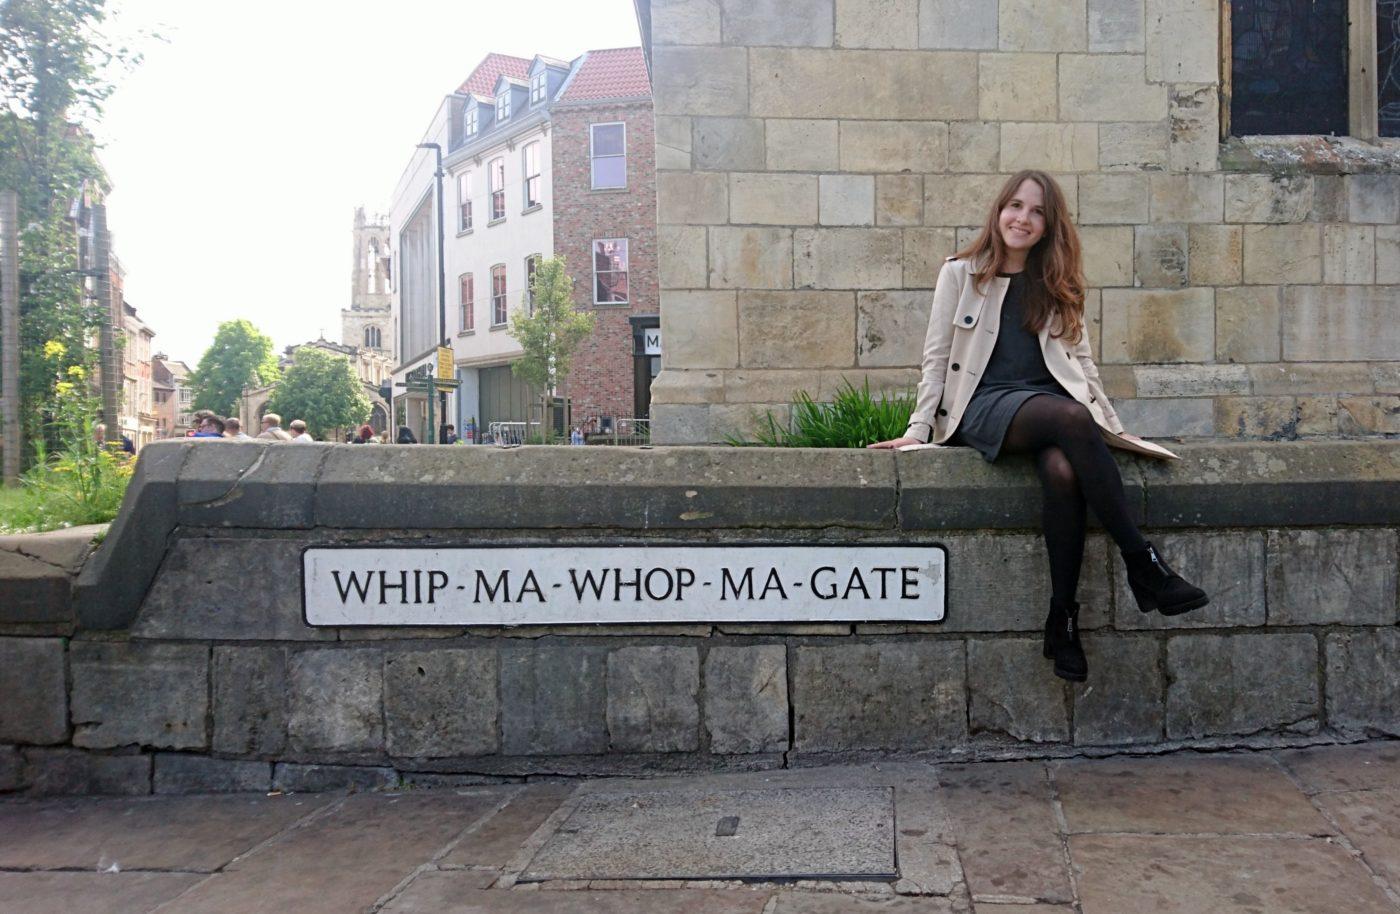 whip-ma-whop-ma gate york